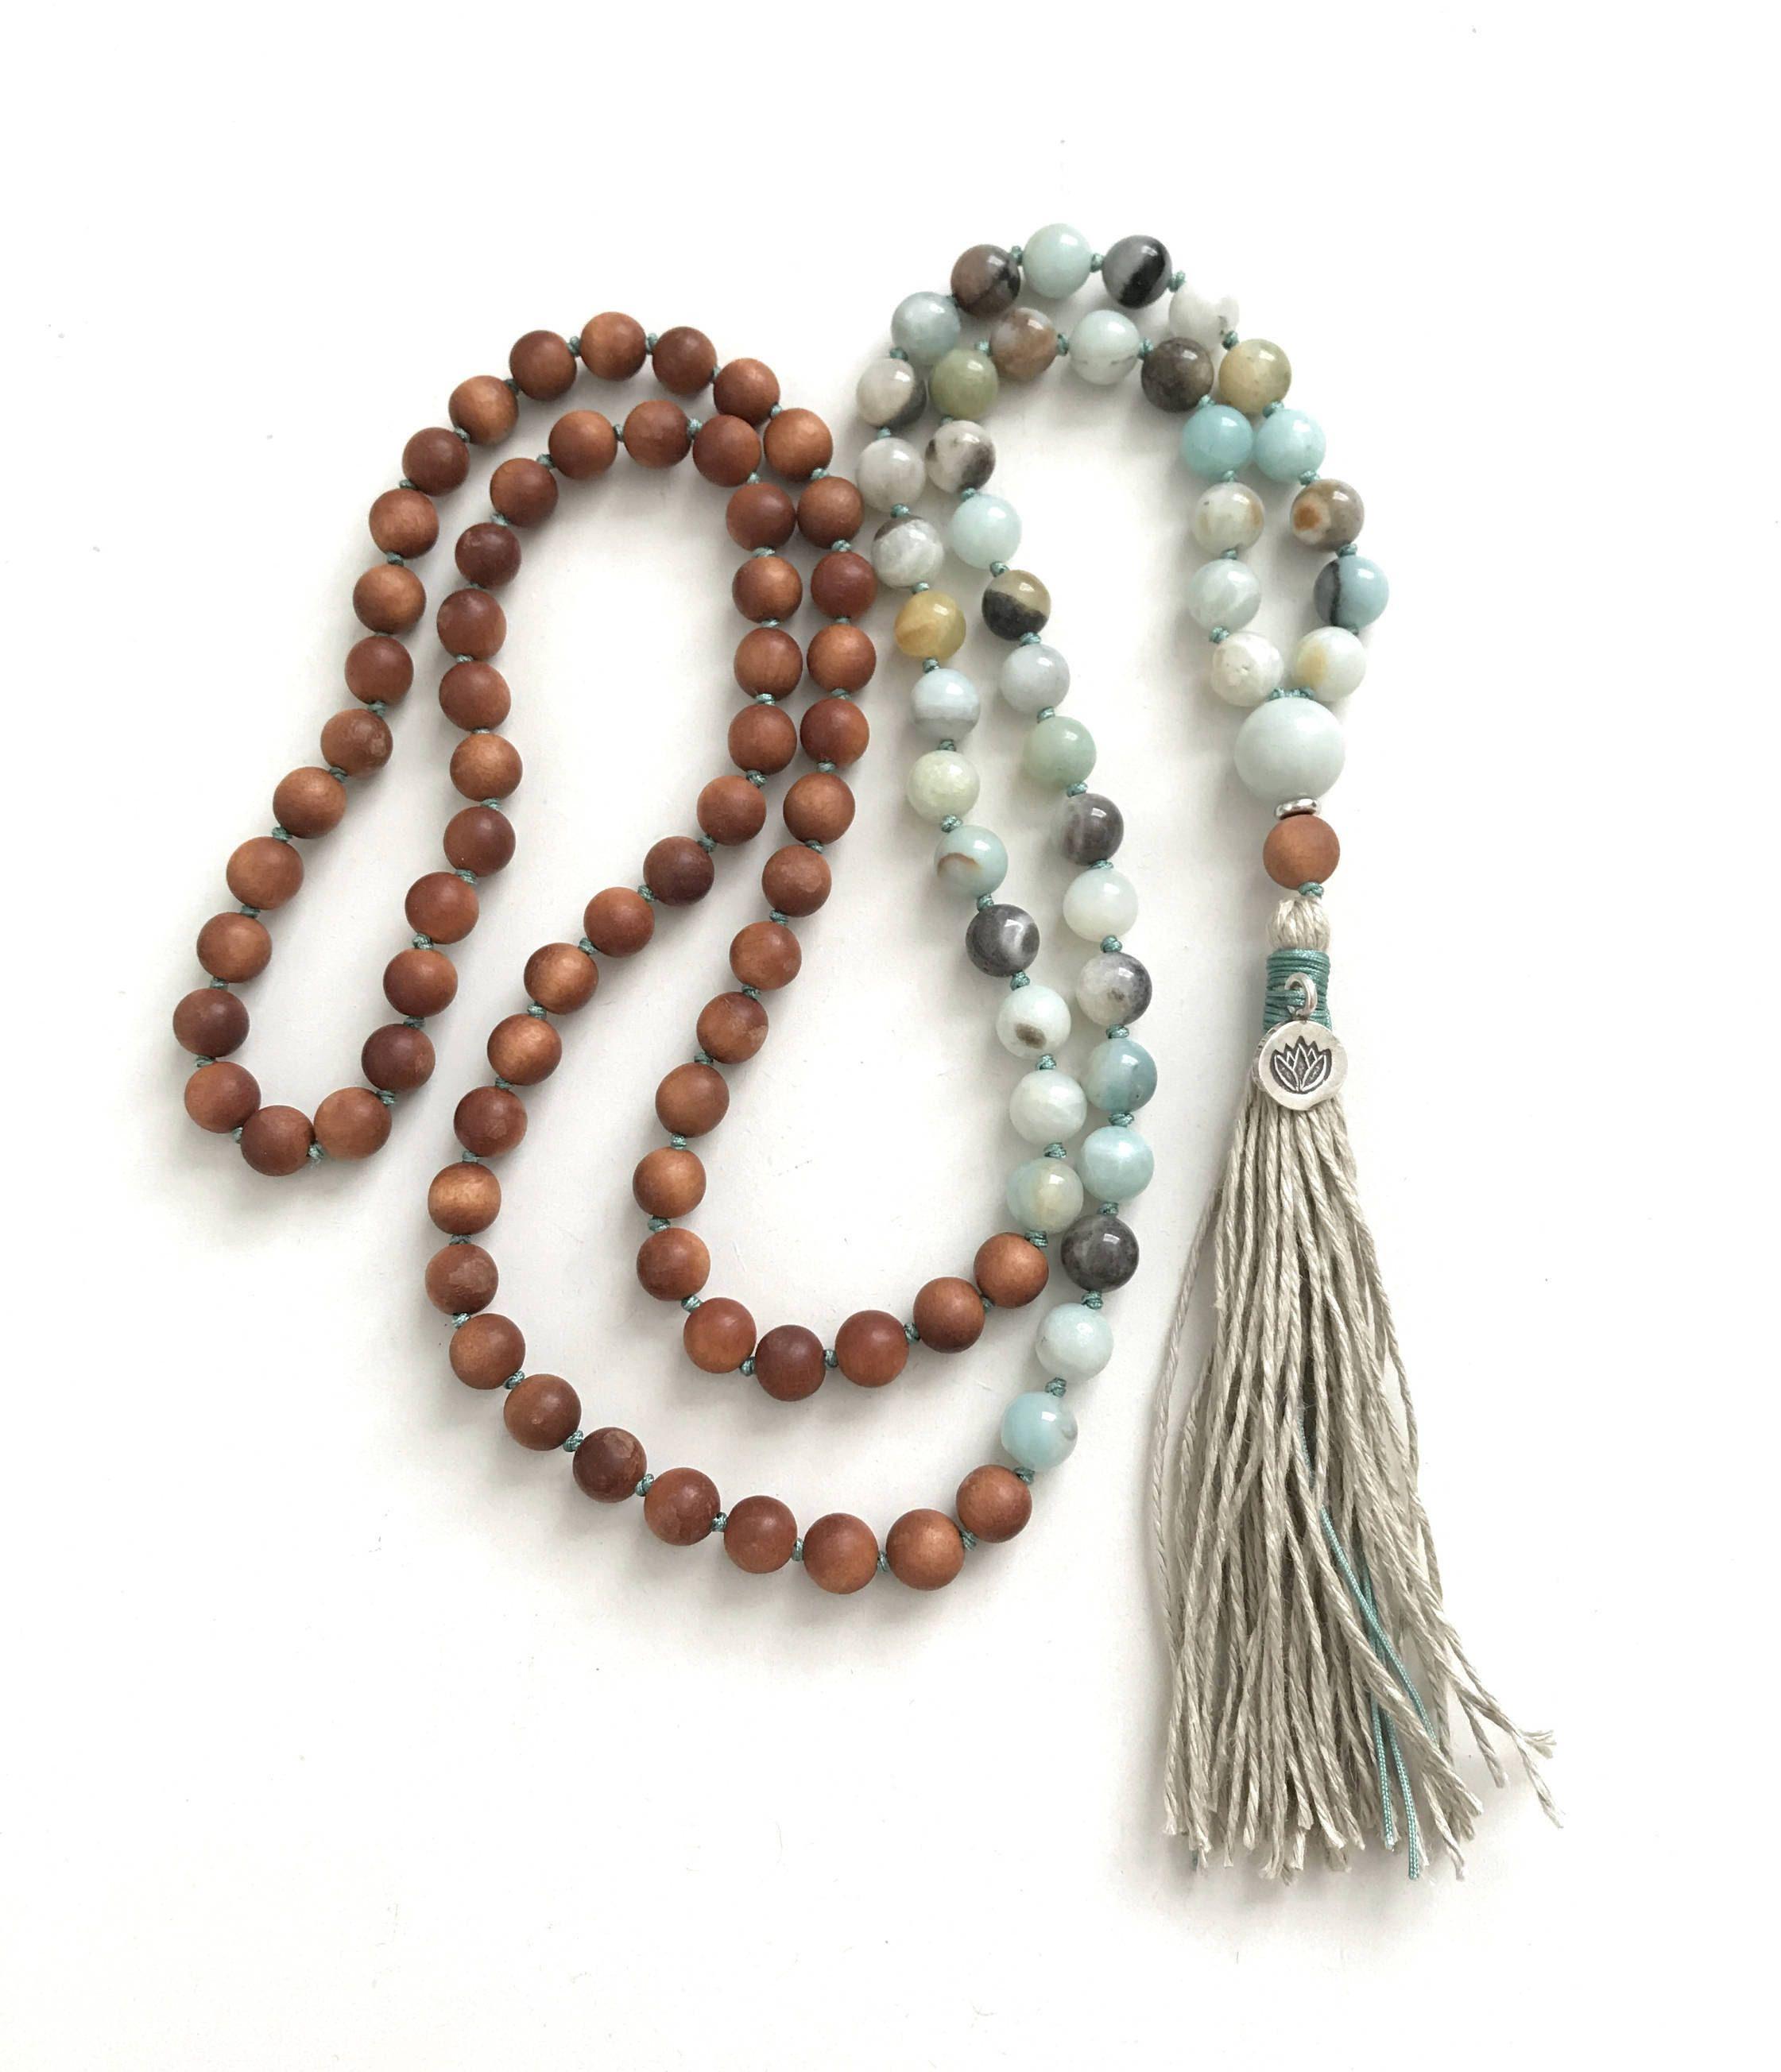 108 Bead Mala Sandalwood And Amazonite Mala Necklace Lotus